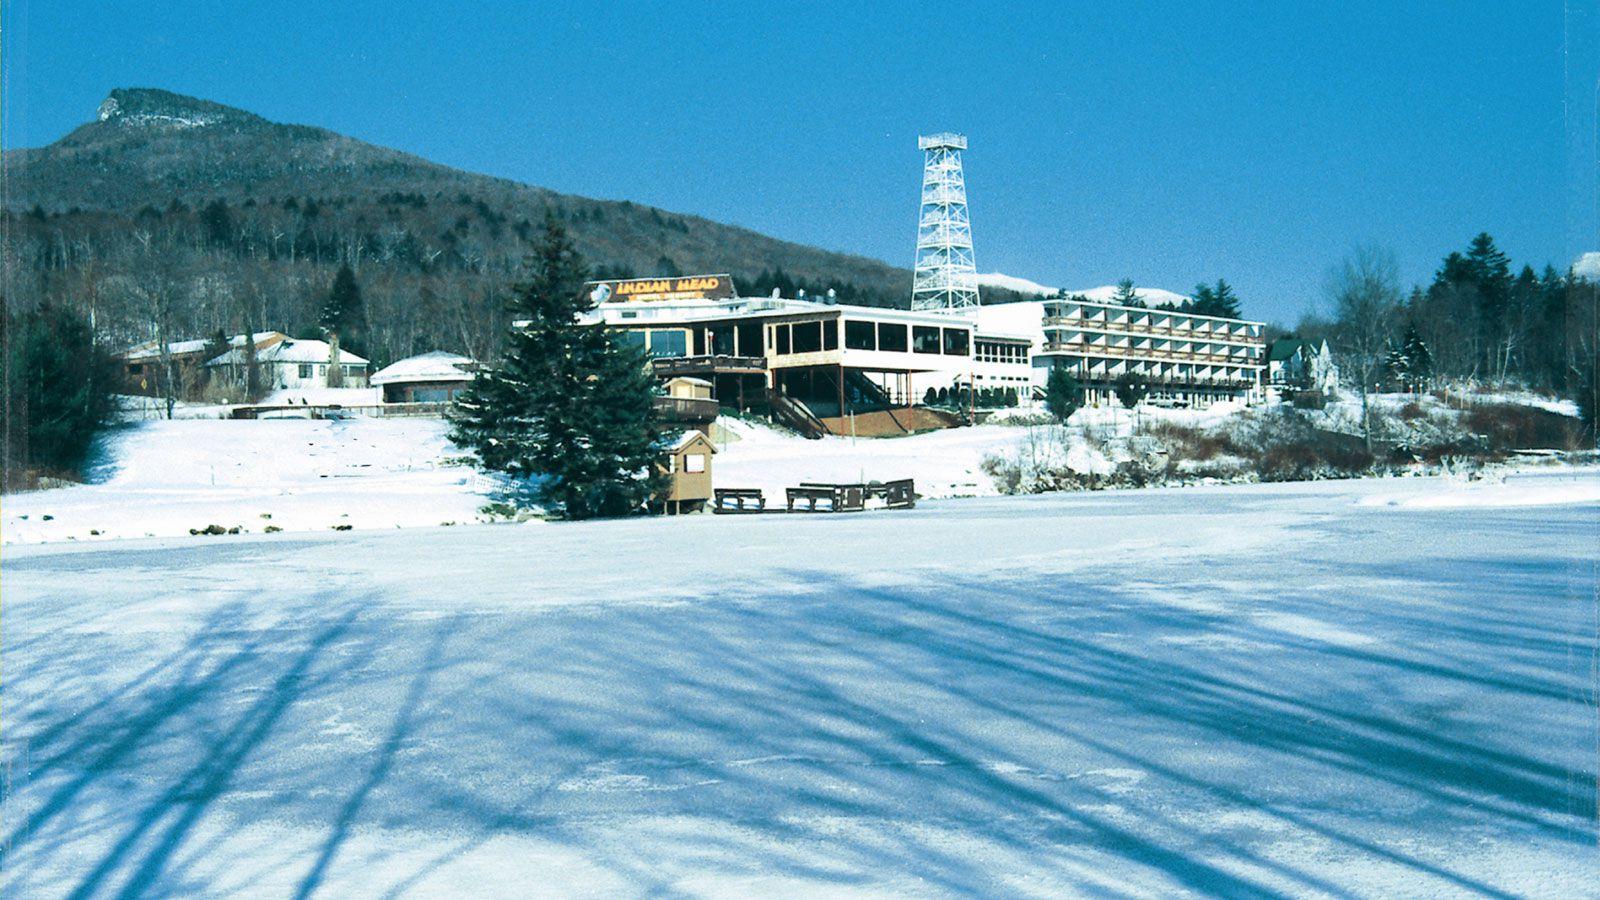 Indian Head Resort School Ski Trip Accommodation